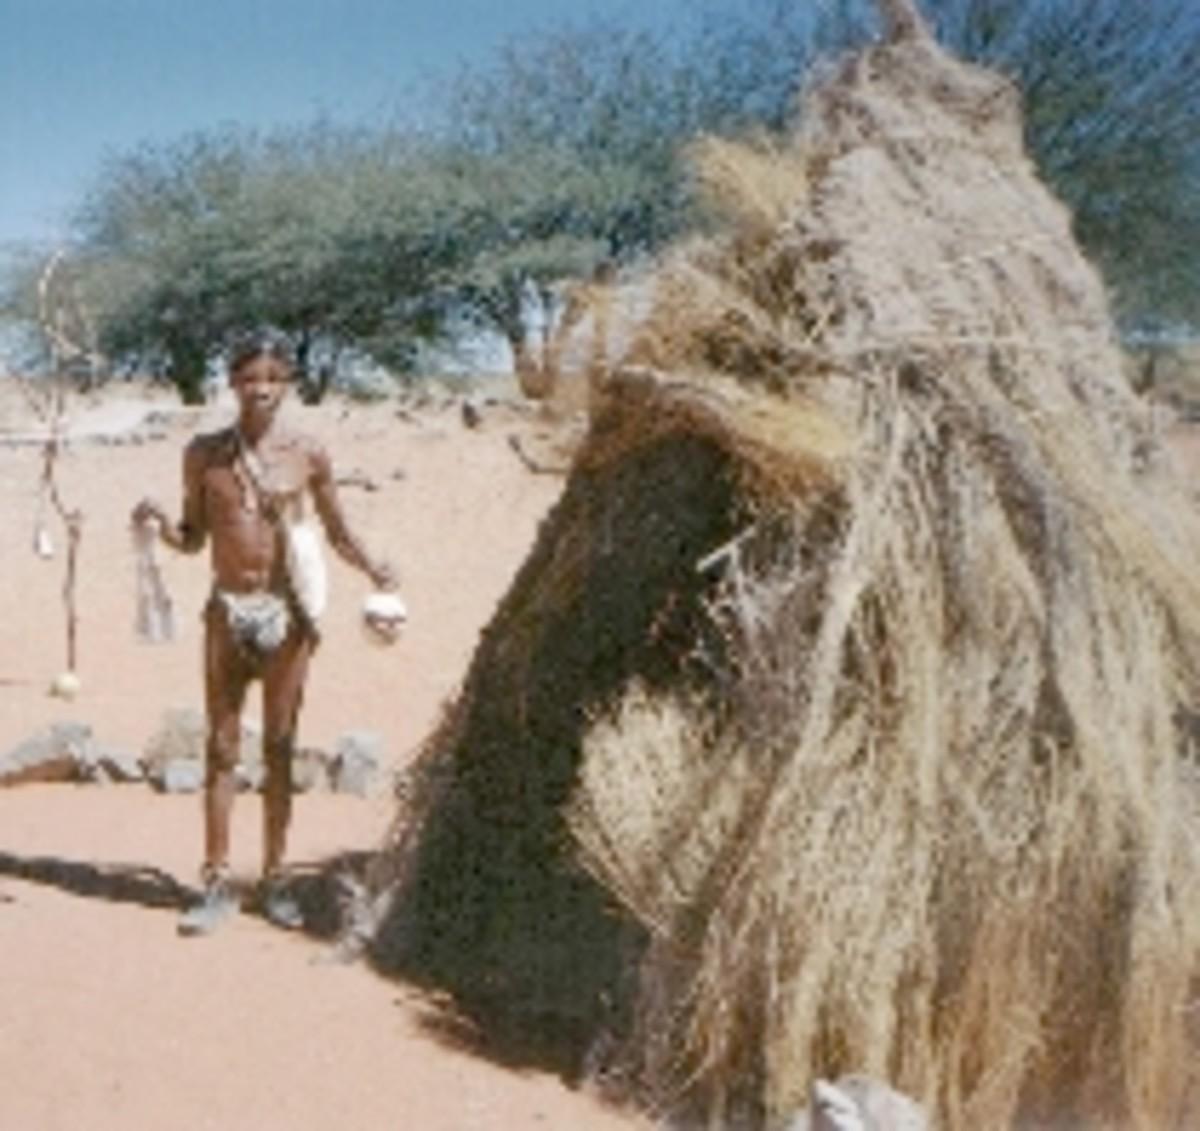 Bushman hut